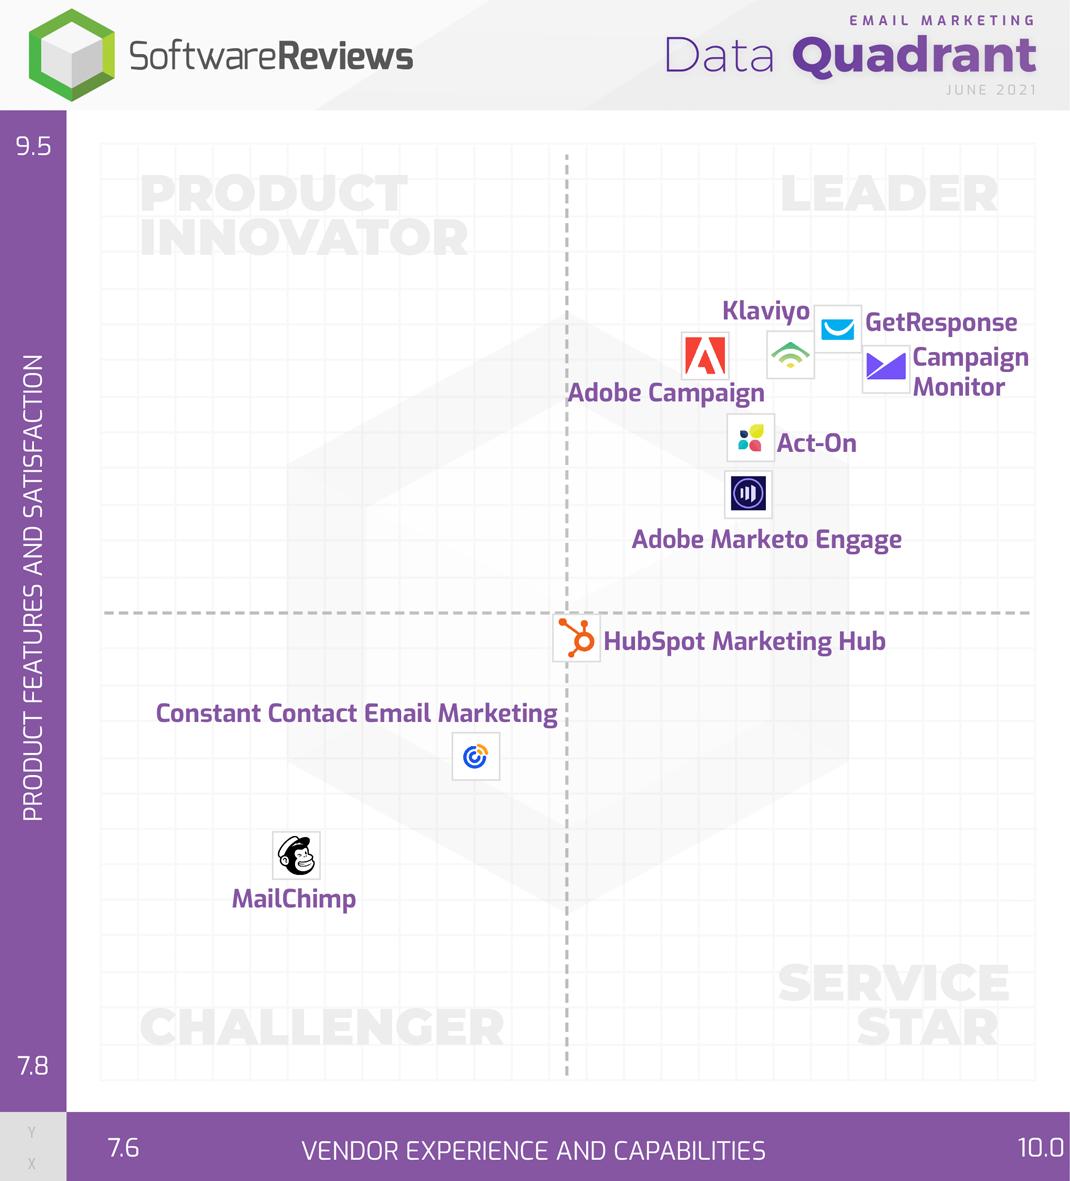 Email Marketing Data Quadrant